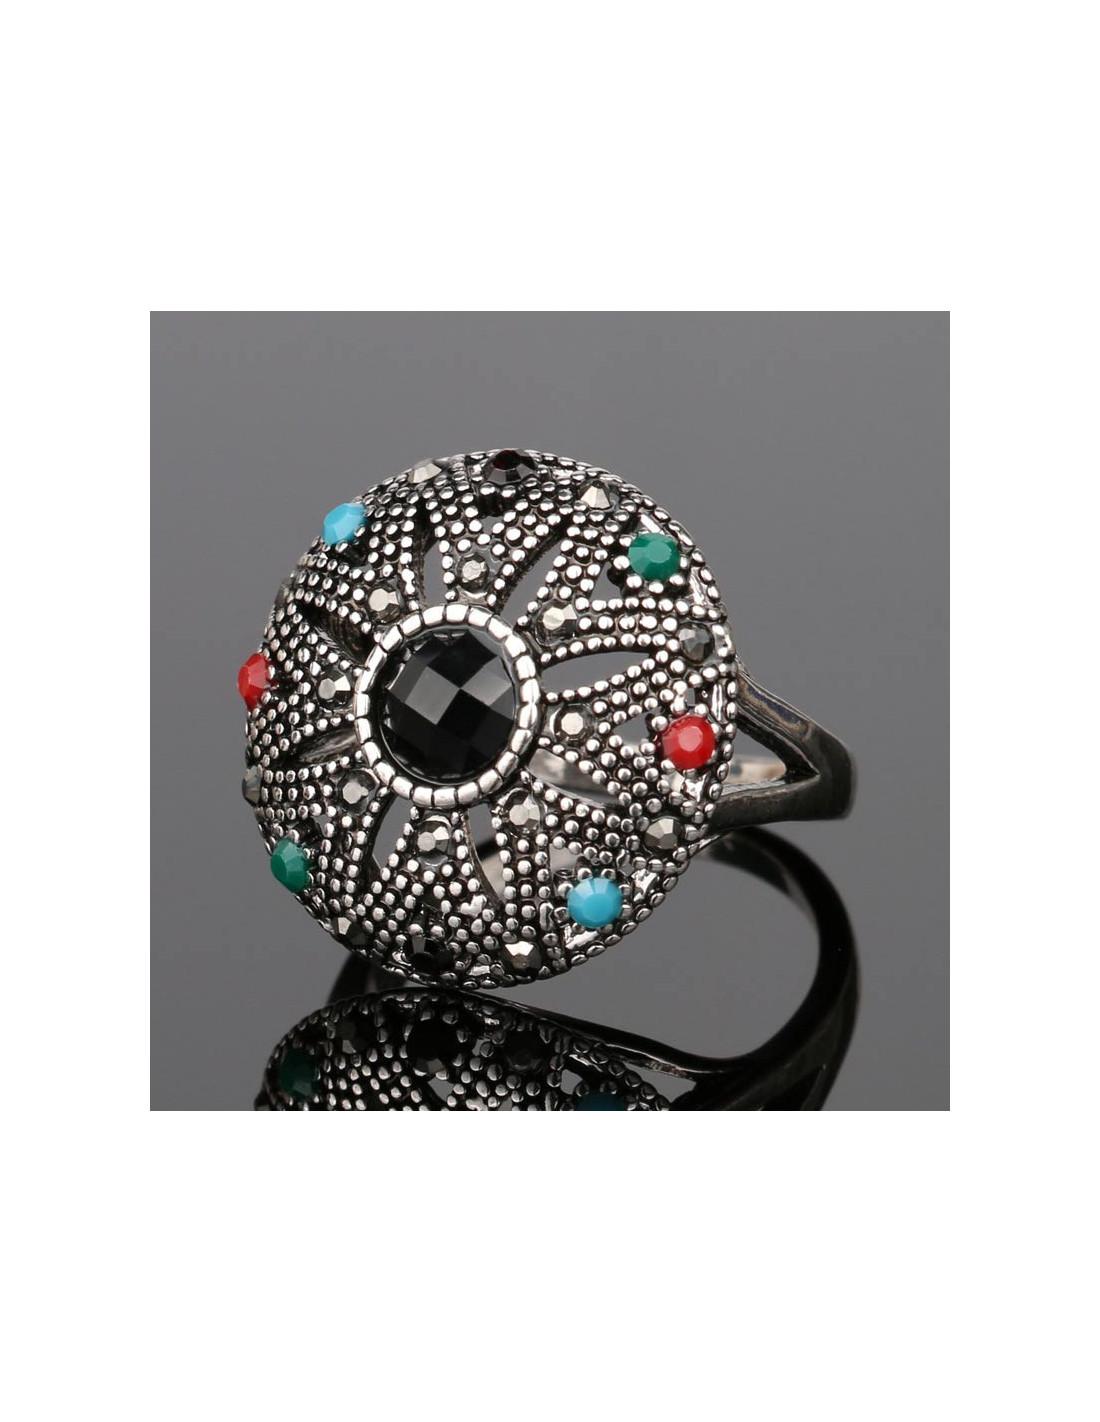 Inel Argintiu Vintage Model Rotund Cu Cristale Colorate Si